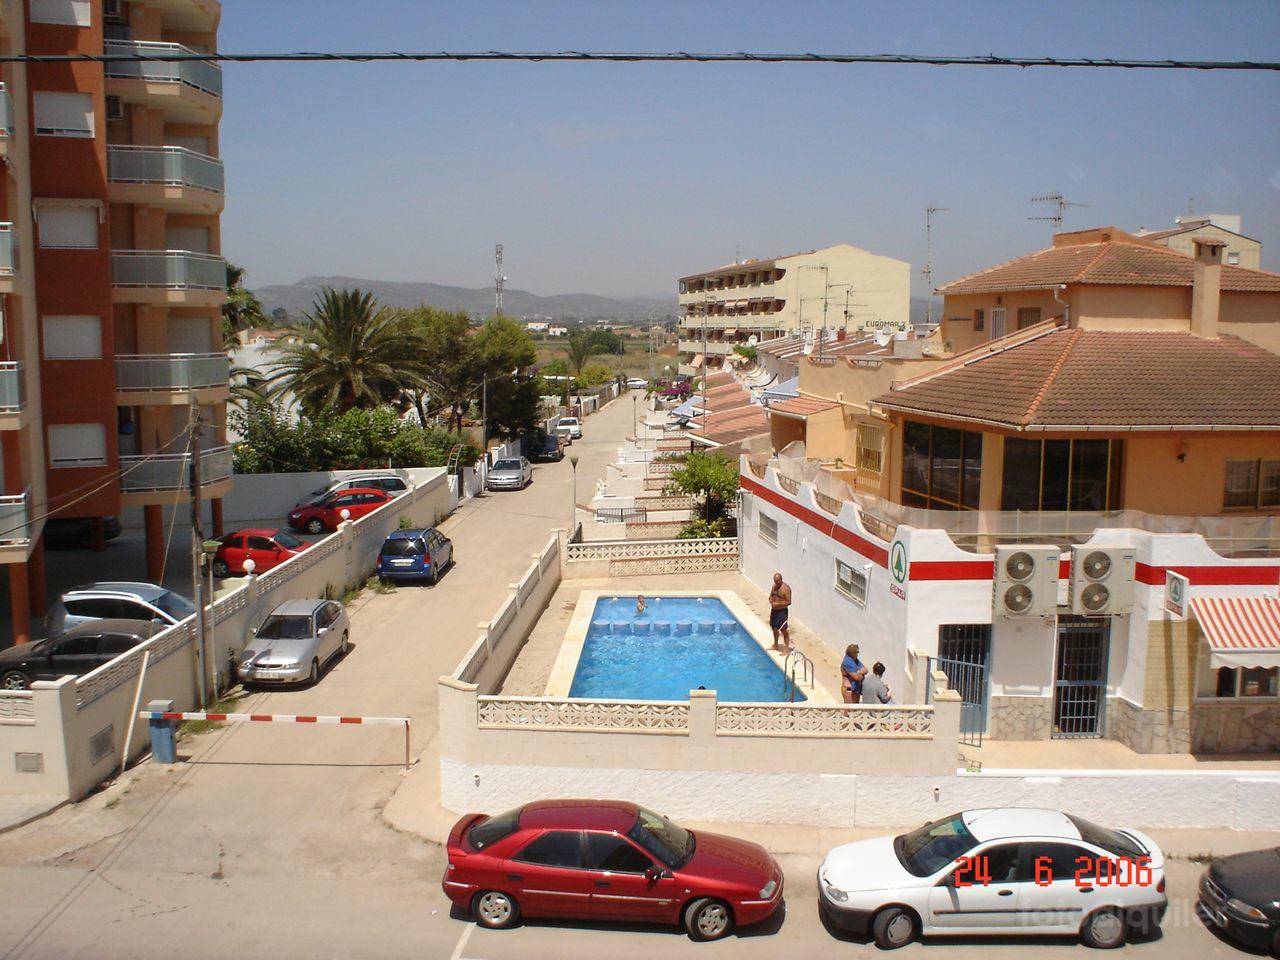 Alquiler de apartamento en planta baja con terraza en Peñíscola, Castellón, ref.: peniscola-11155